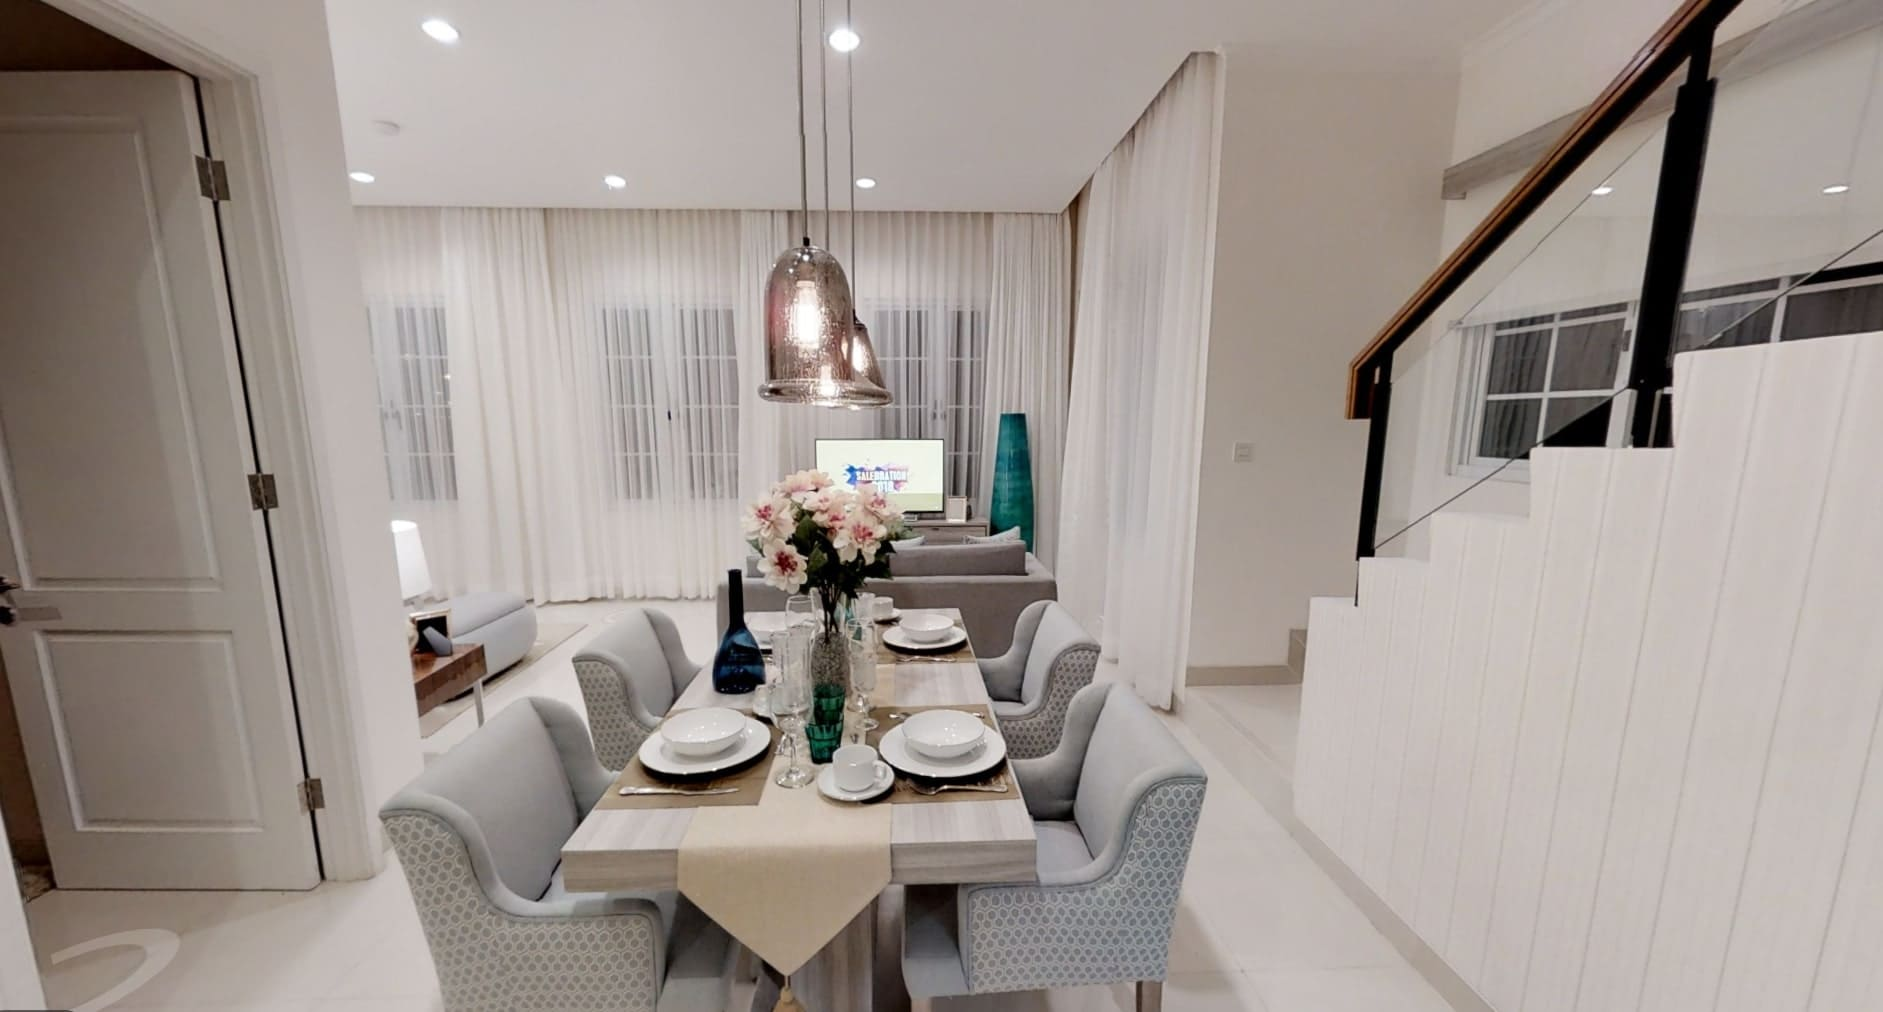 Tipe-164_180-Dining-Room